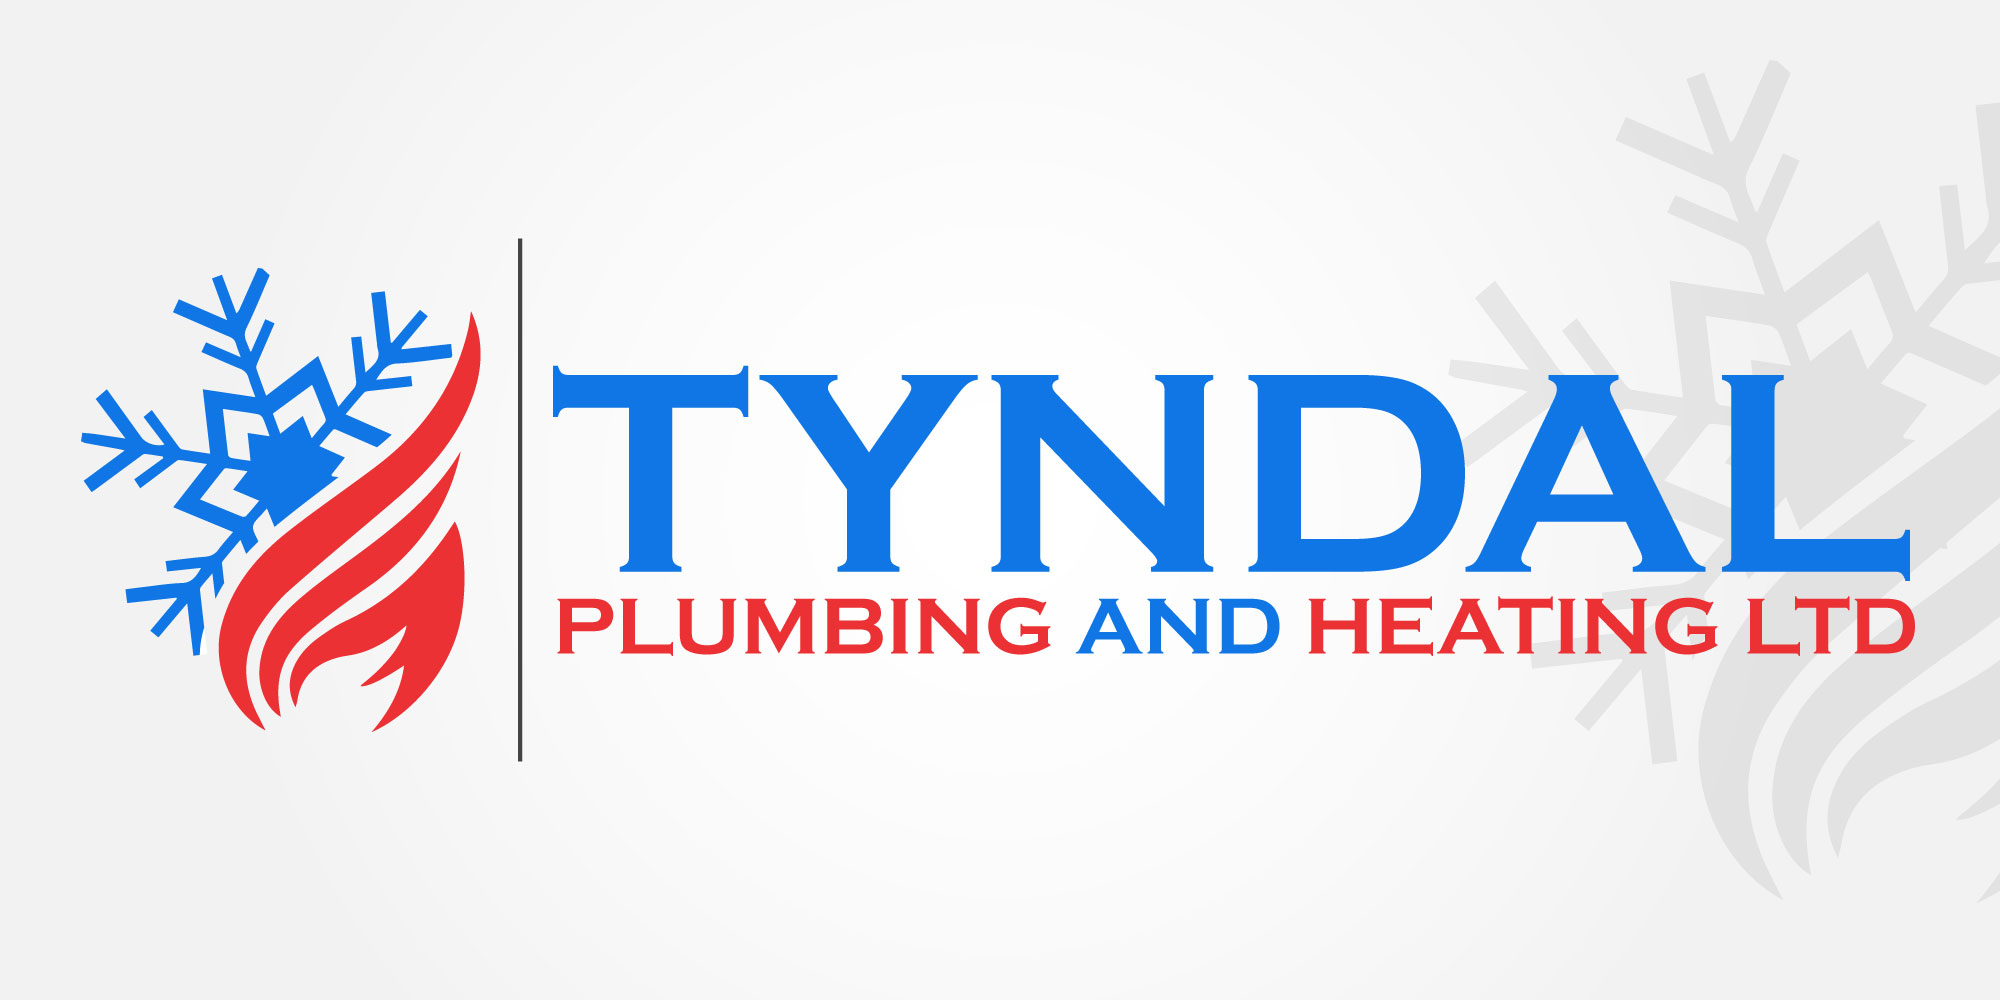 Logo Design by Kamran Khan - Entry No. 122 in the Logo Design Contest Imaginative Logo Design for Tyndall Plumbing & Heating.